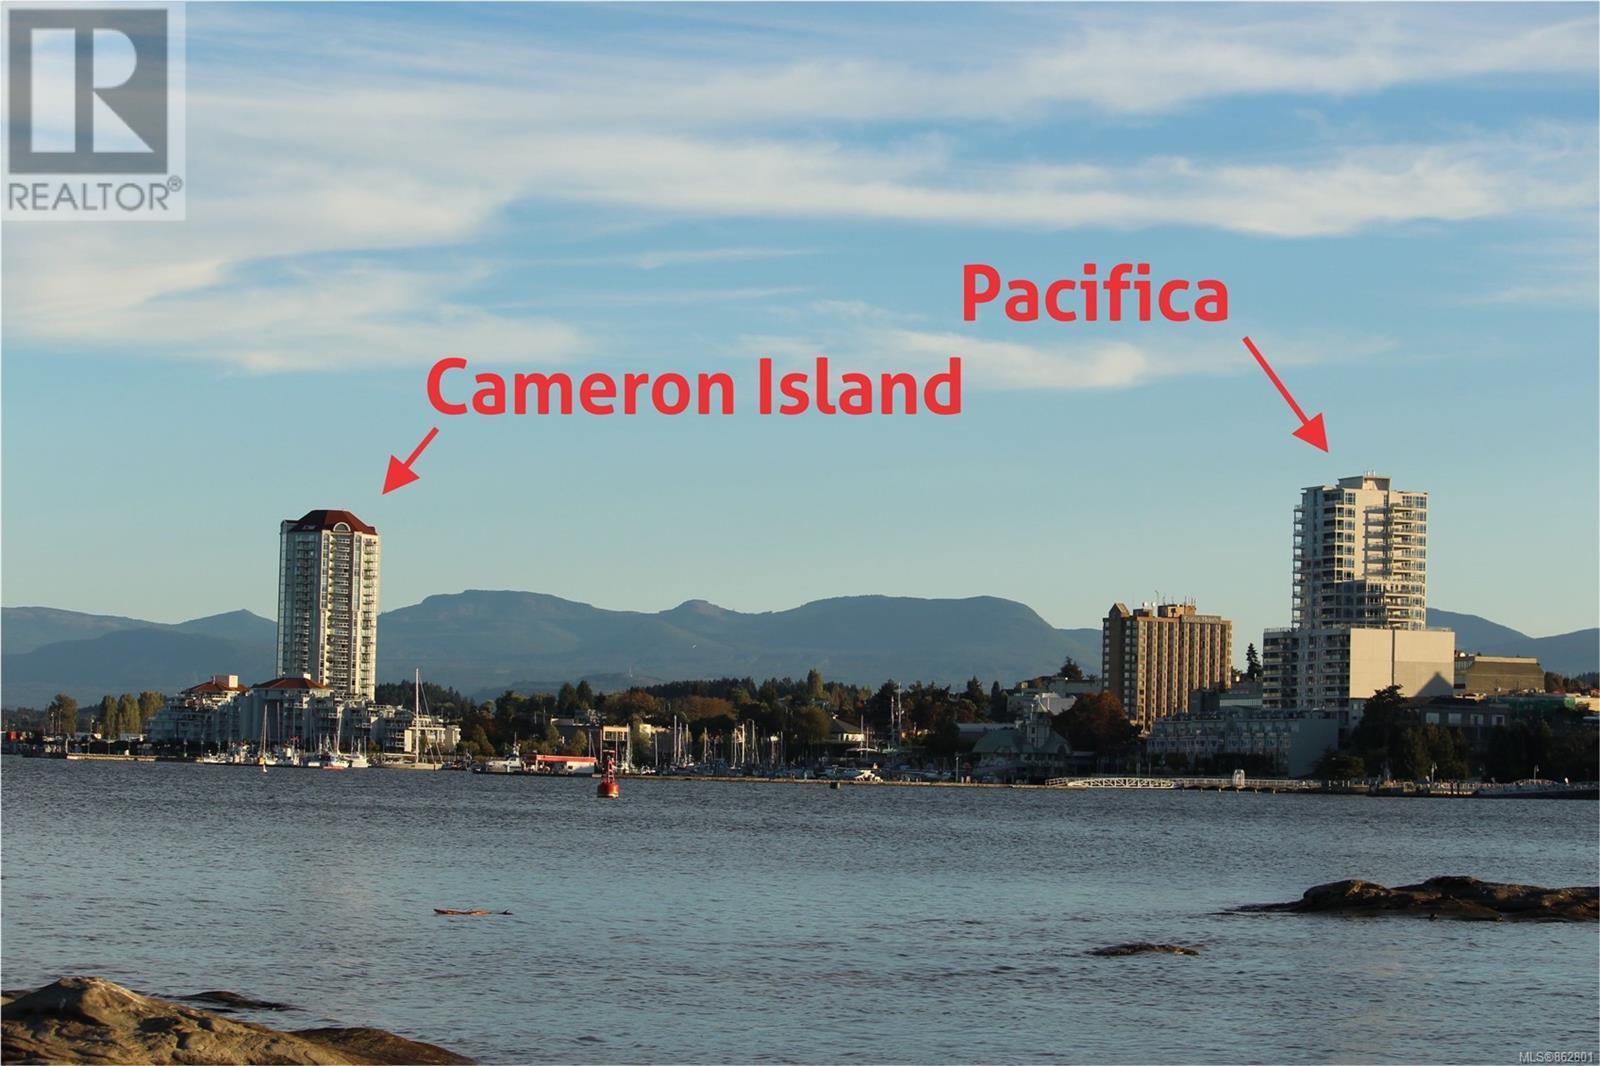 203 150 Promenade Dr, Nanaimo, British Columbia  V9R 6M6 - Photo 3 - 862801